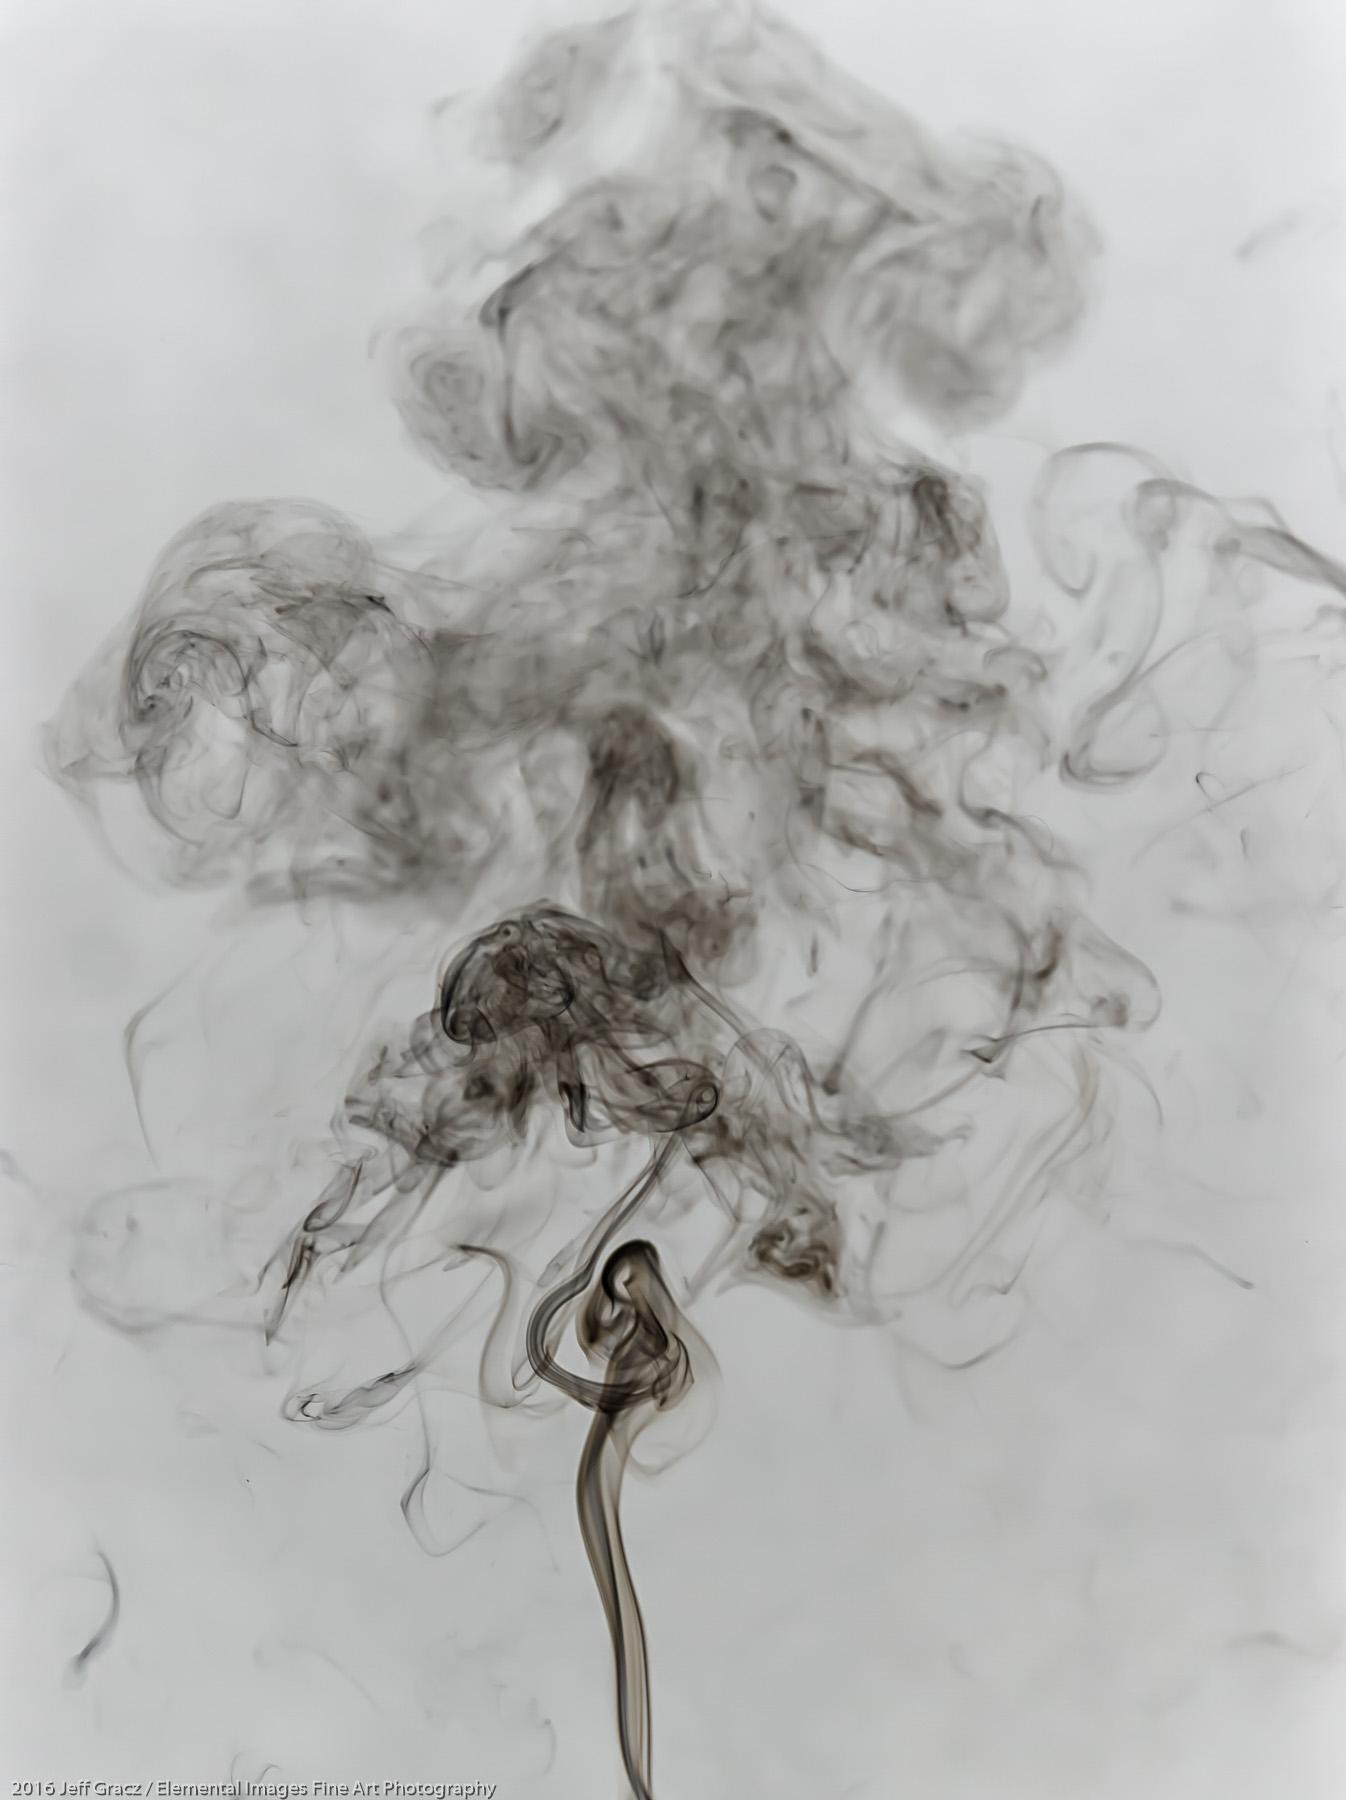 Smoke 35 | Vancouver | WA | USA - © 2016 Jeff Gracz / Elemental Images Fine Art Photography - All Rights Reserved Worldwide